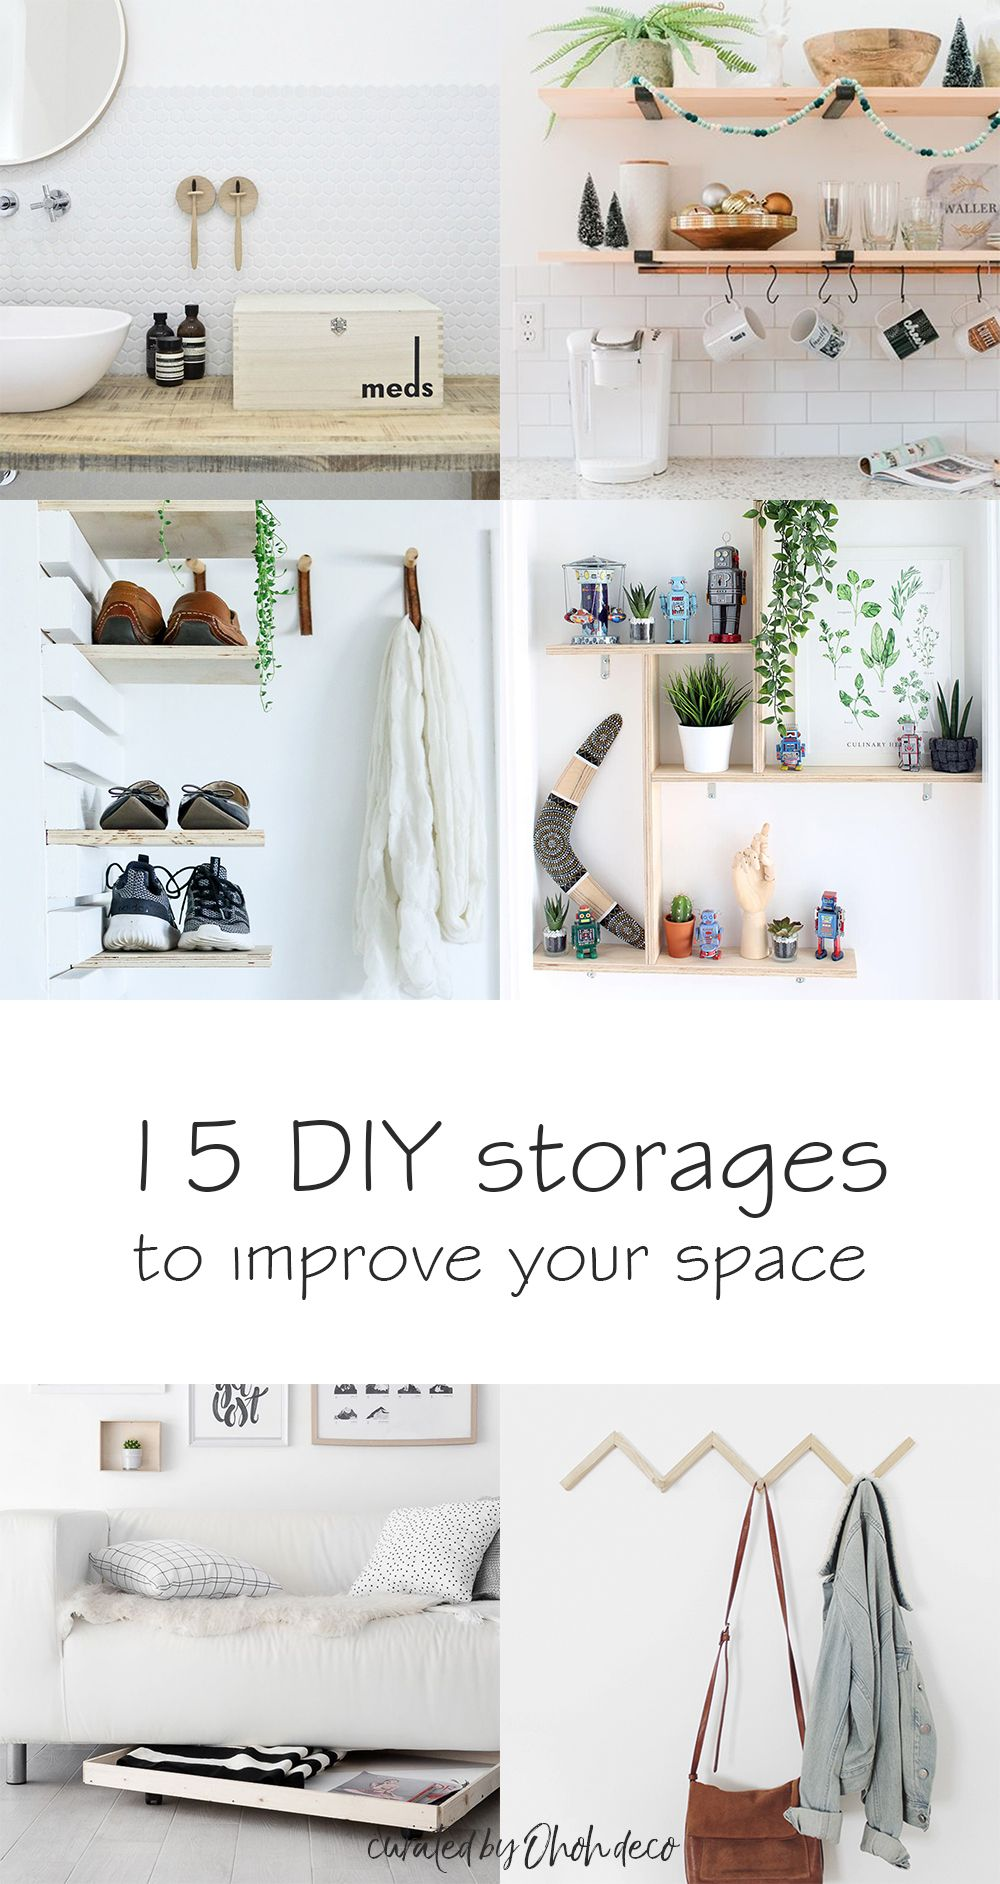 Easy Diy Storage To Improve Your Space Diy Storage Diy Storage